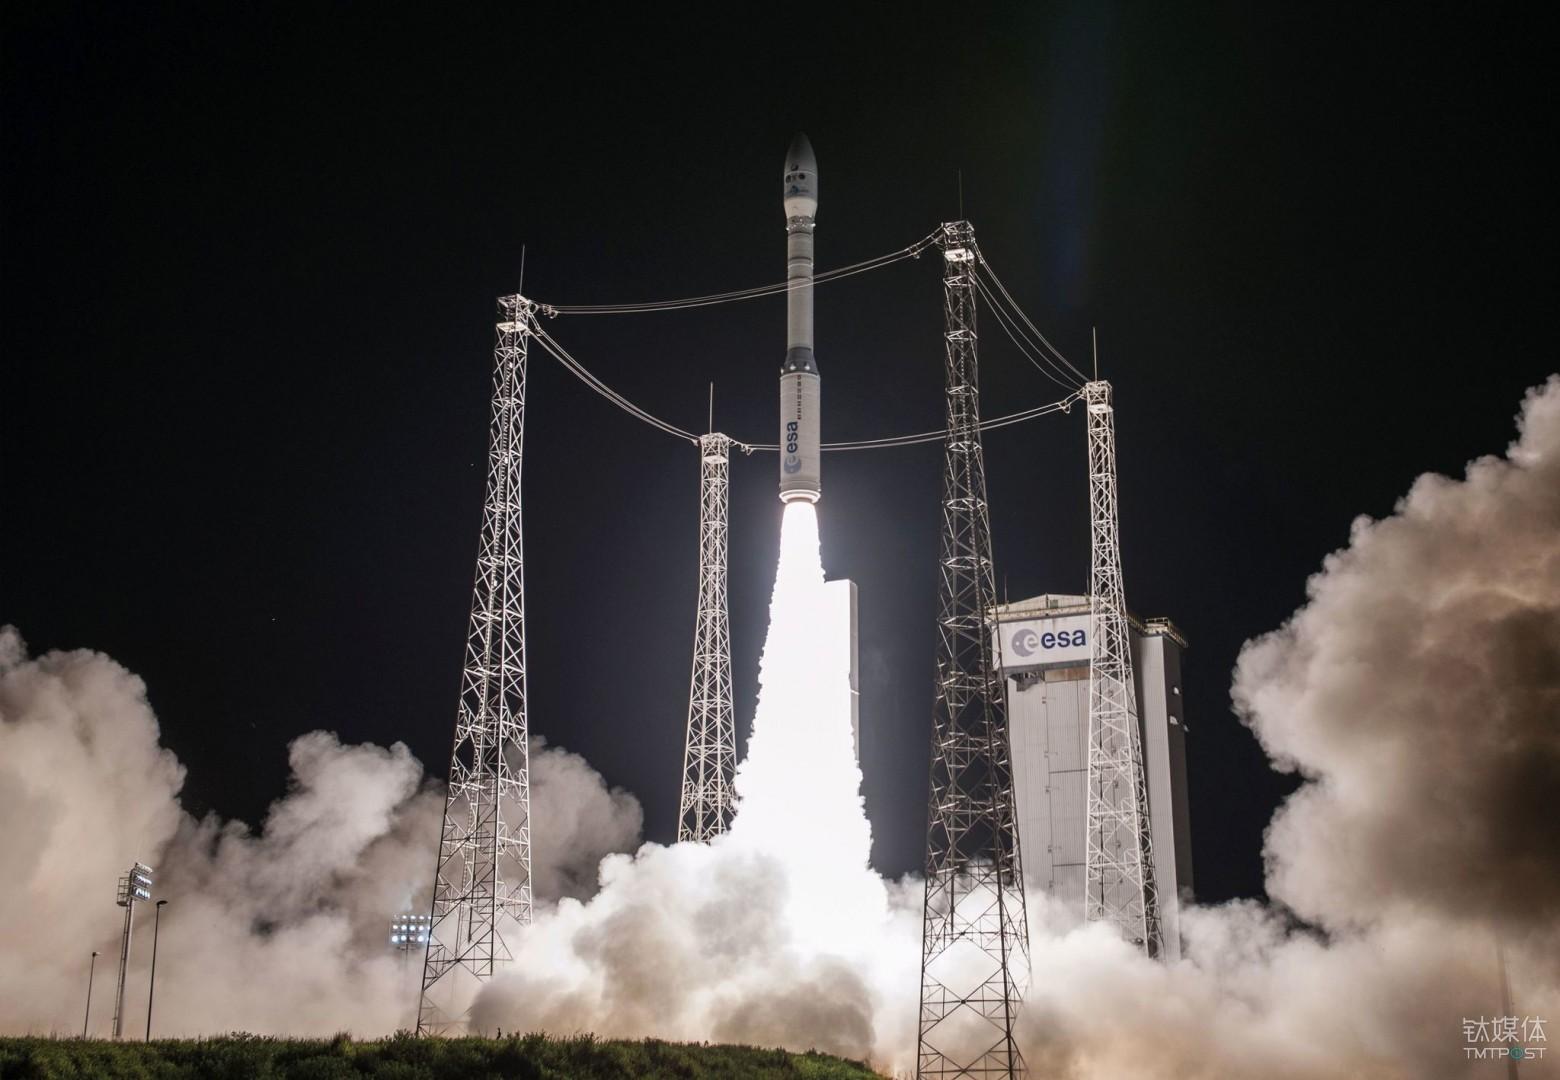 2016年,一支搭载 Terra Bella 微型卫星的火箭成功升空 (Jim Guillon / AFP/Getty Images)